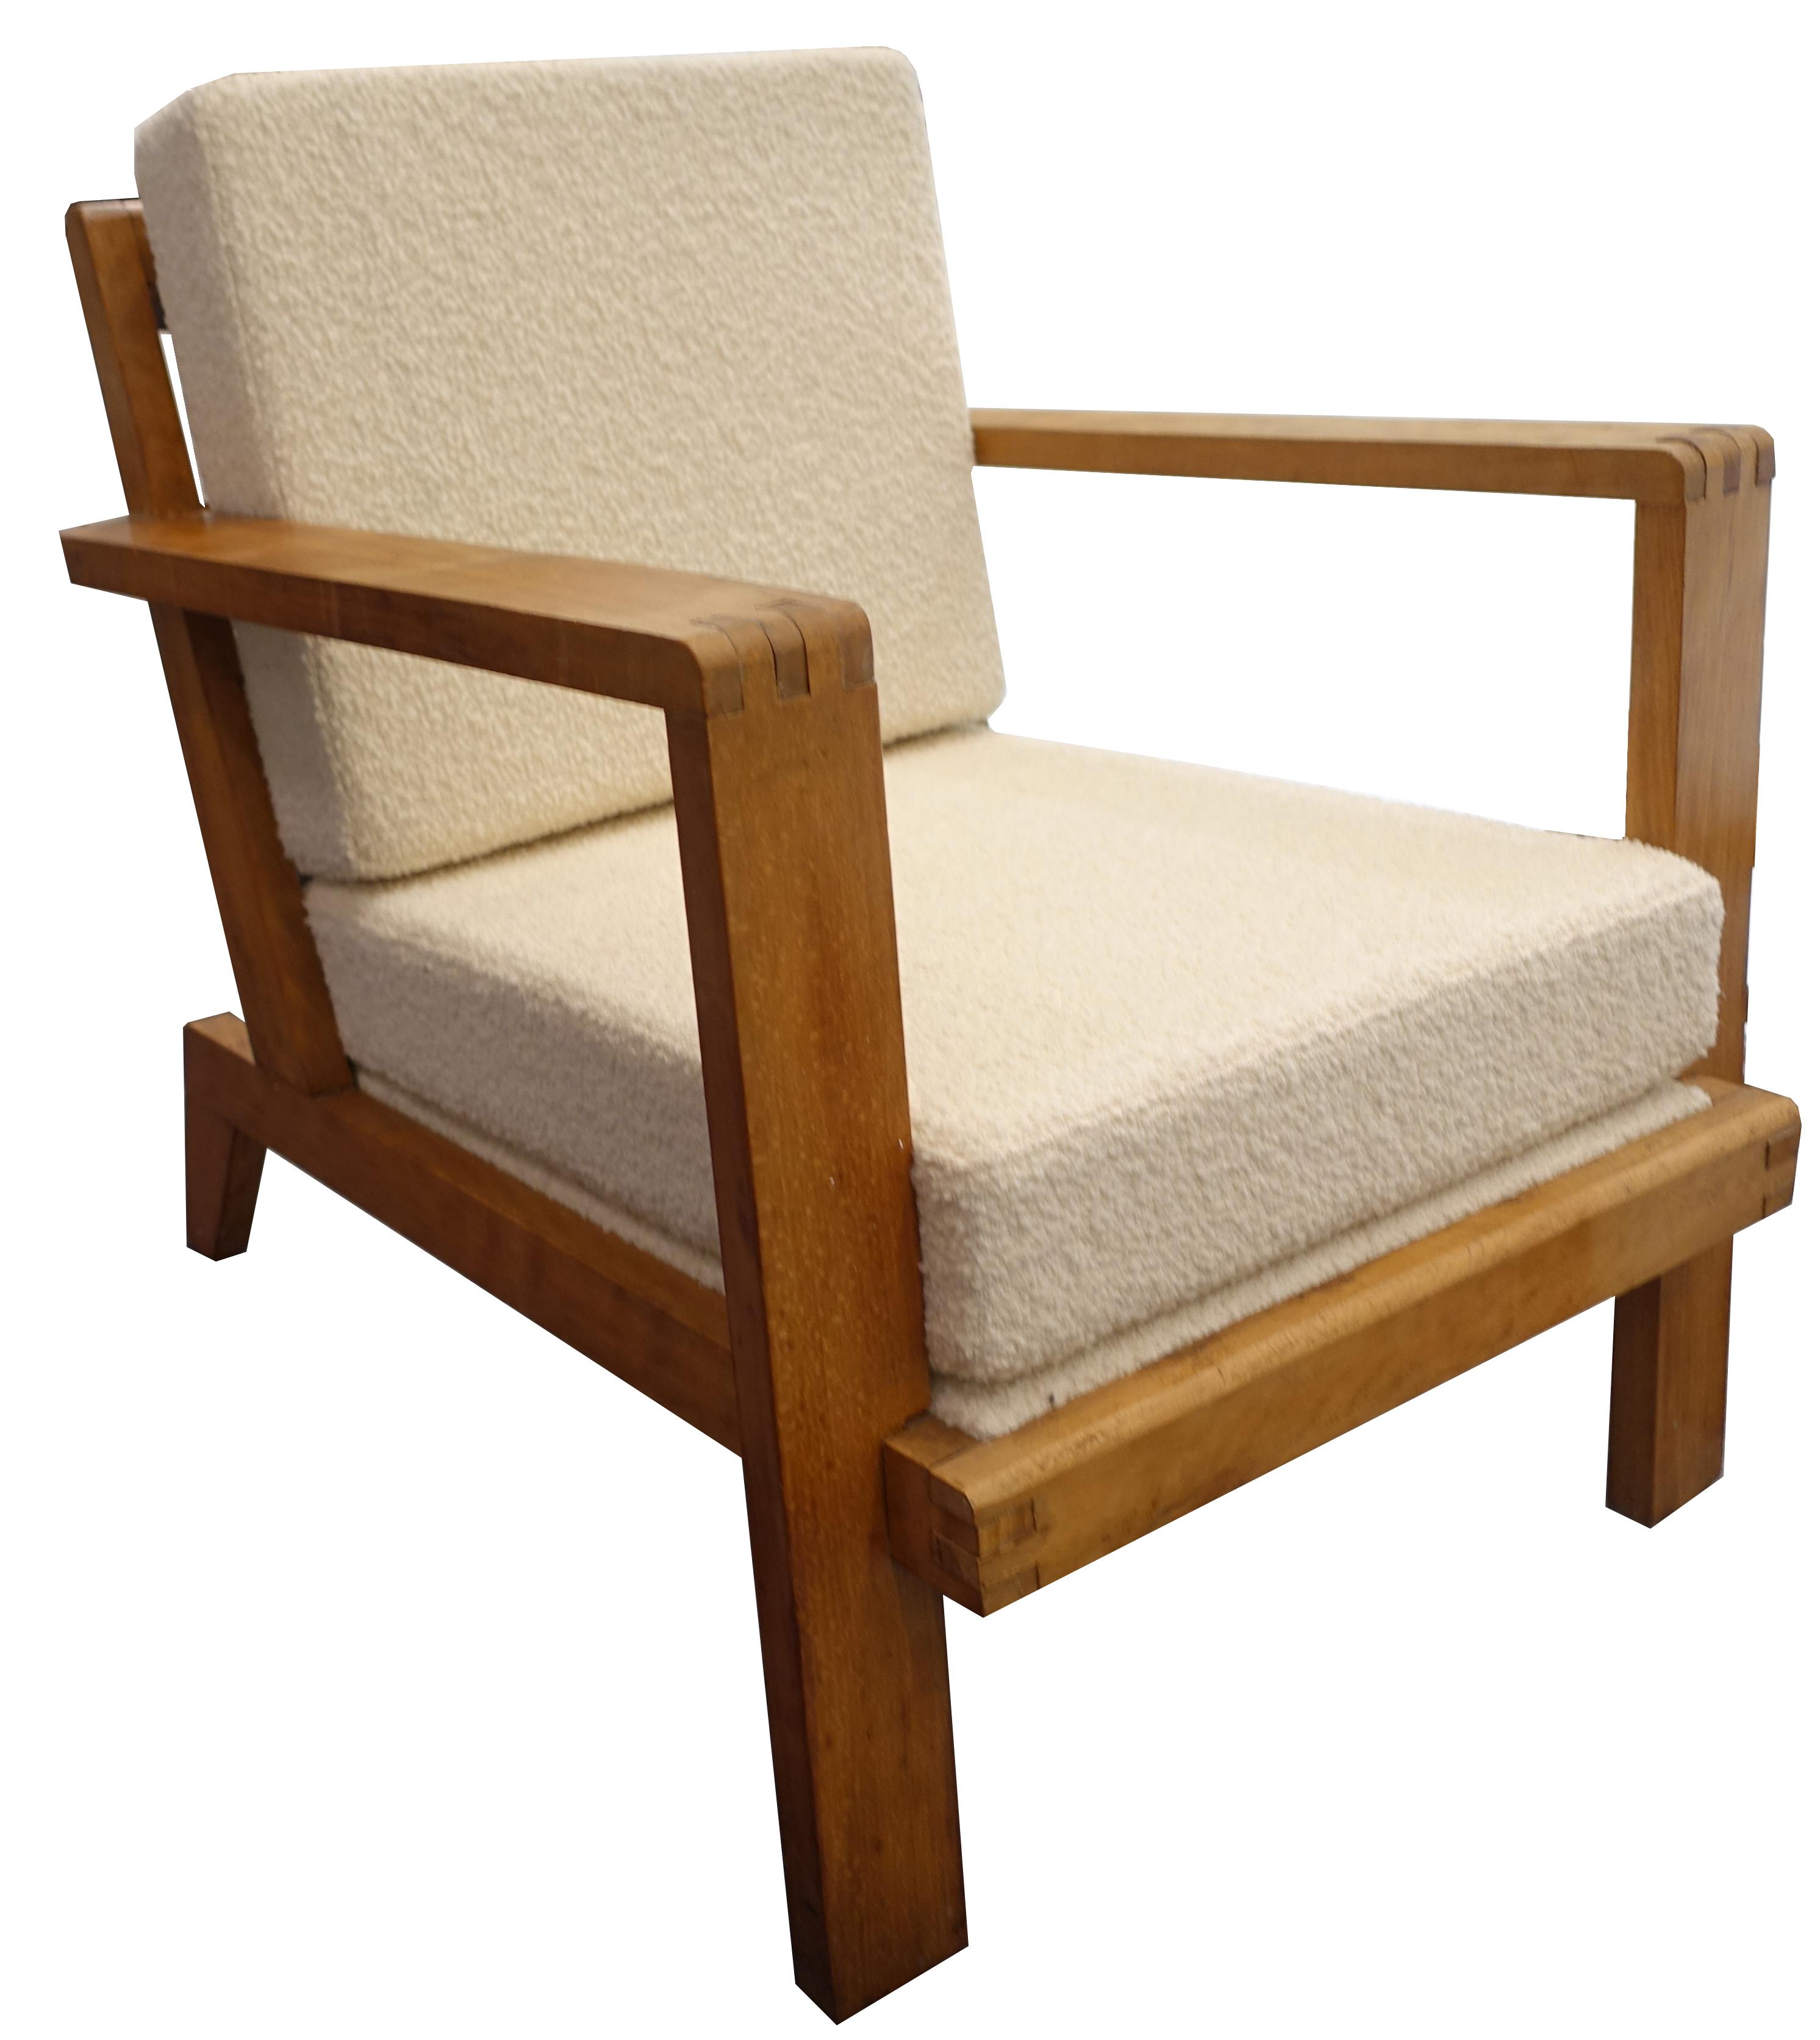 t brown Image 7_rene gabriel chair side